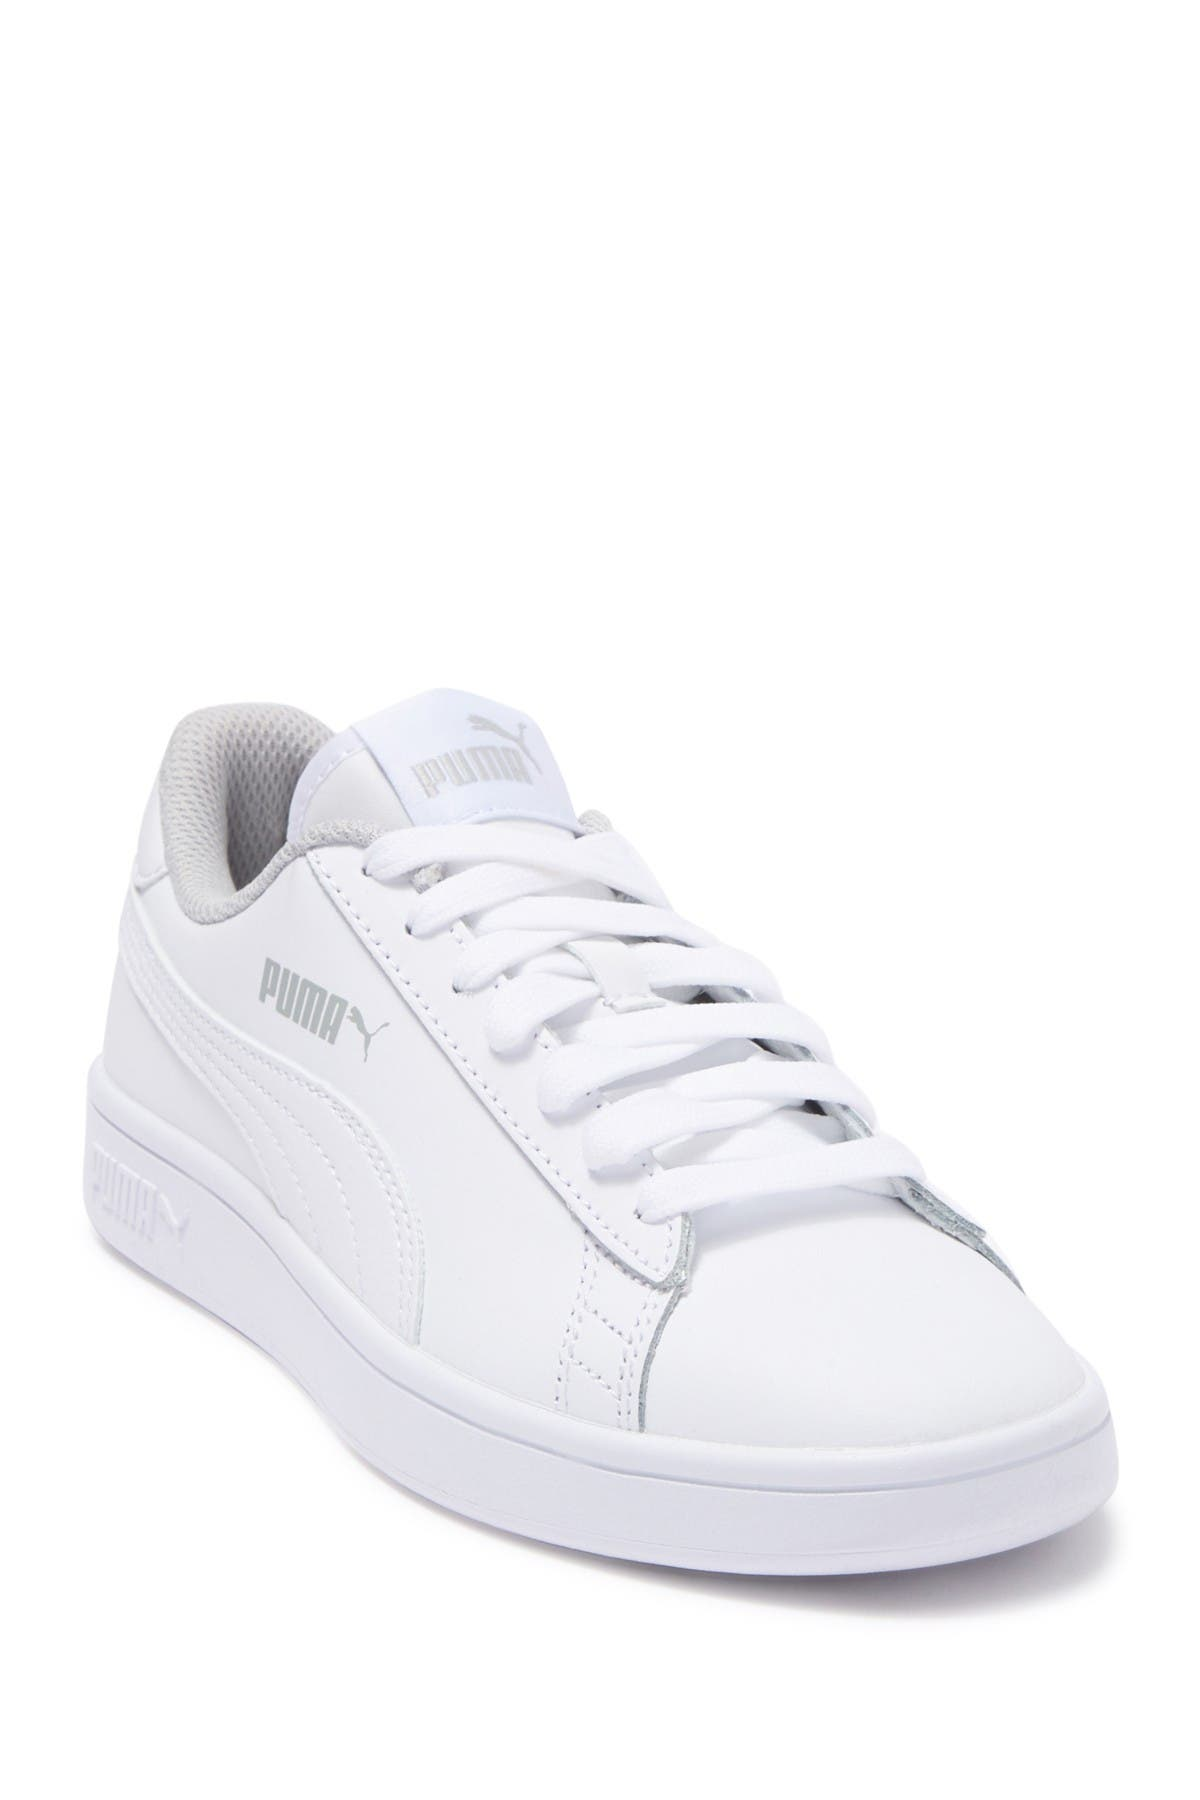 PUMA | Smash V2 L Jr Leather Sneaker